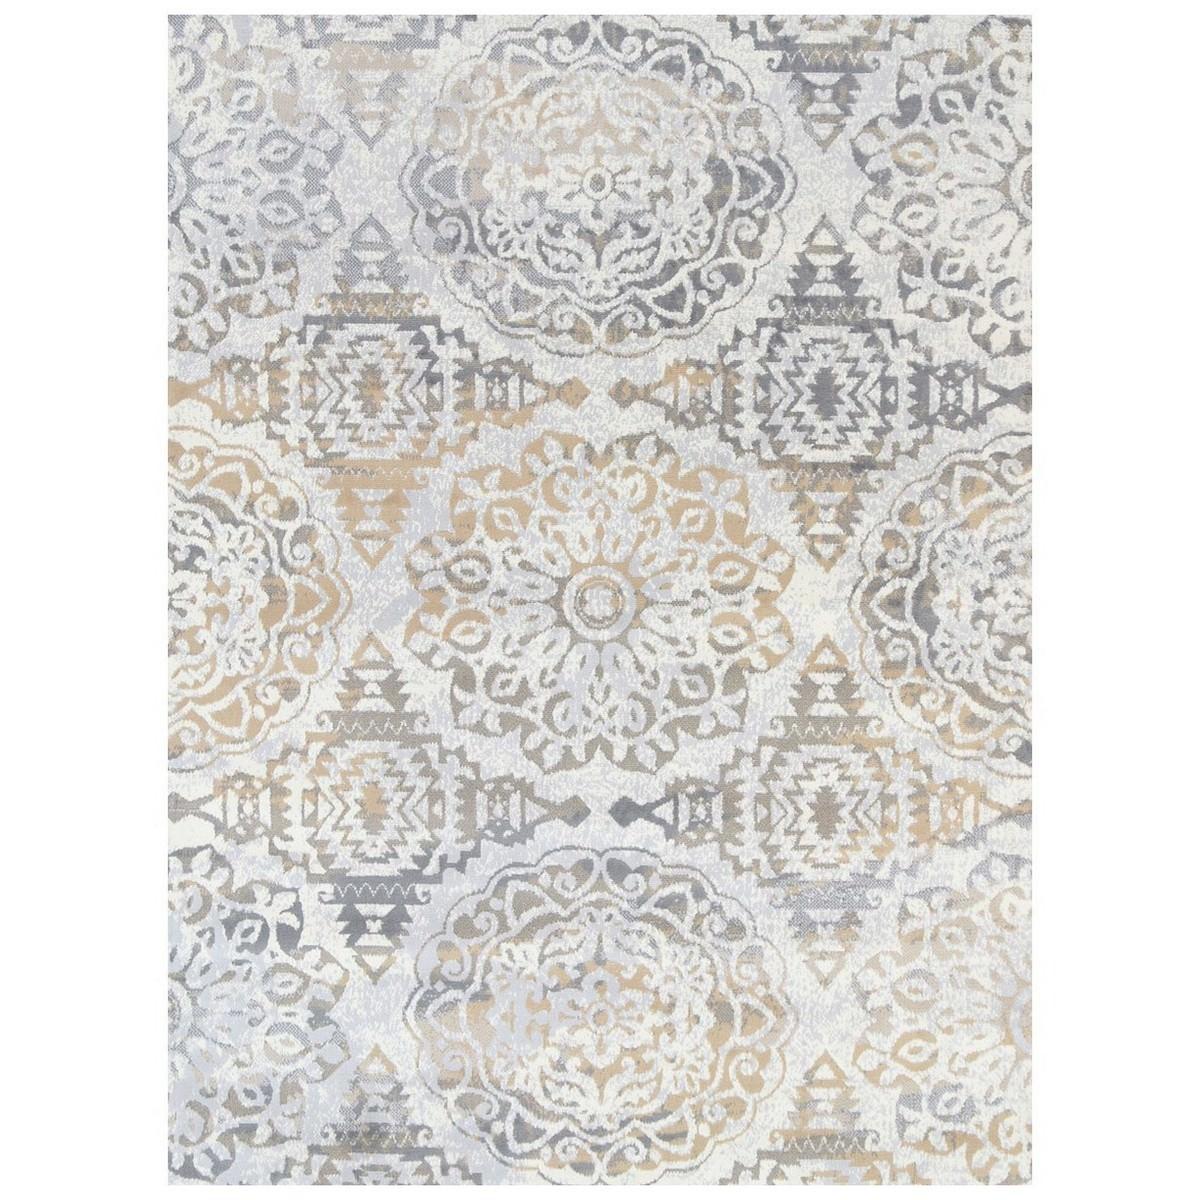 Allure Dilara Oriental Rug, 240x330cm, Beige/Grey